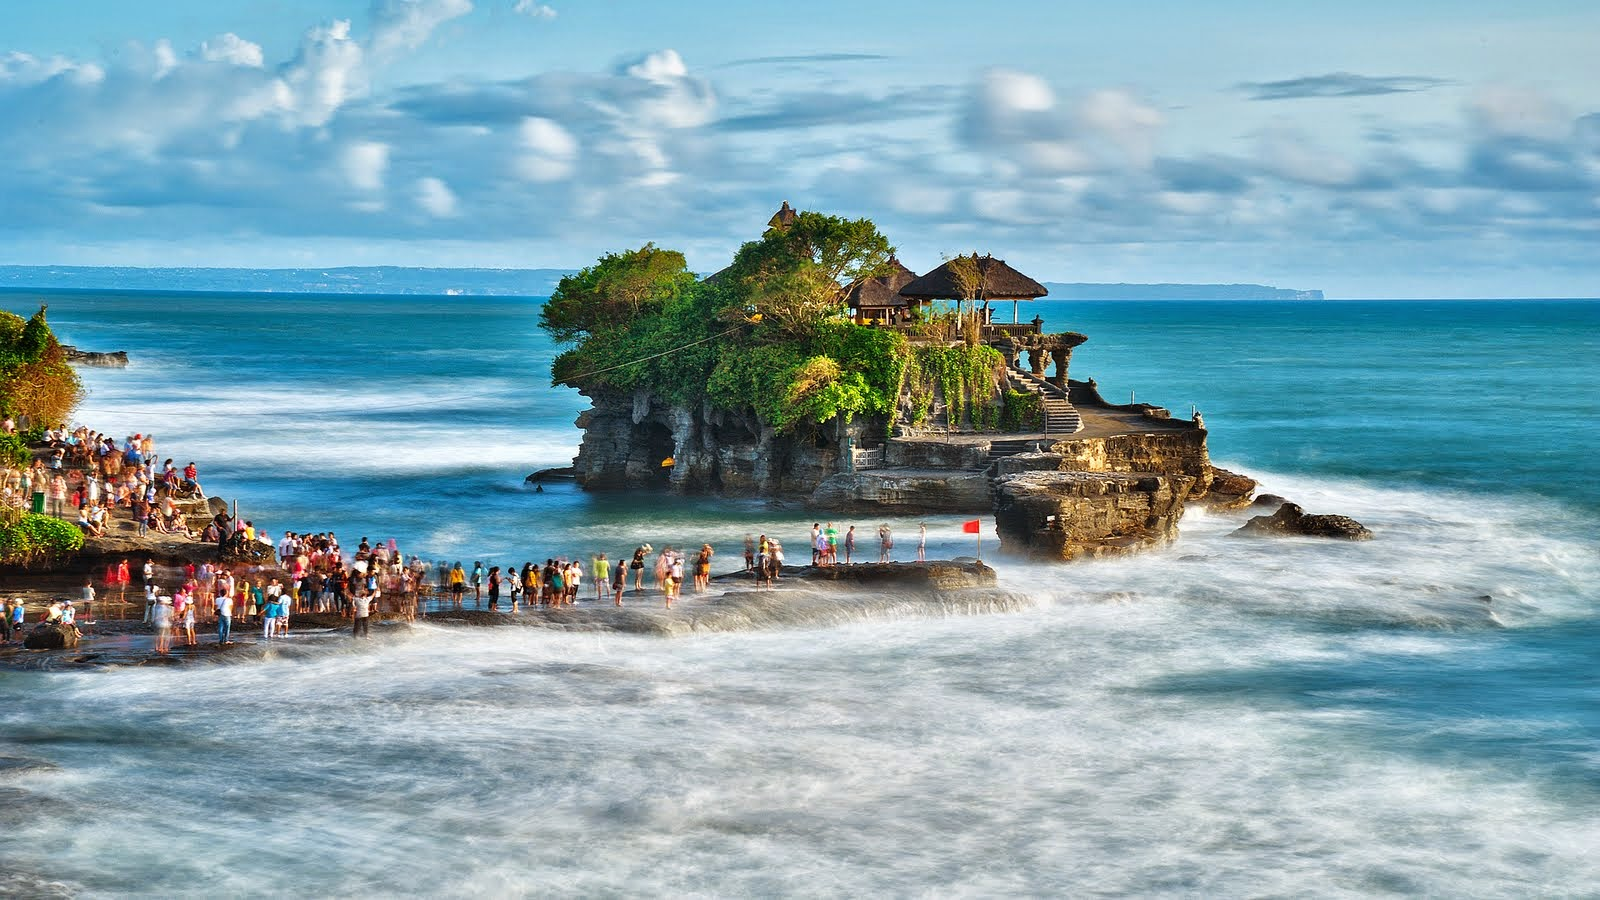 Gambar Pantai Bali Indah dan Cantik Terbaru 2015